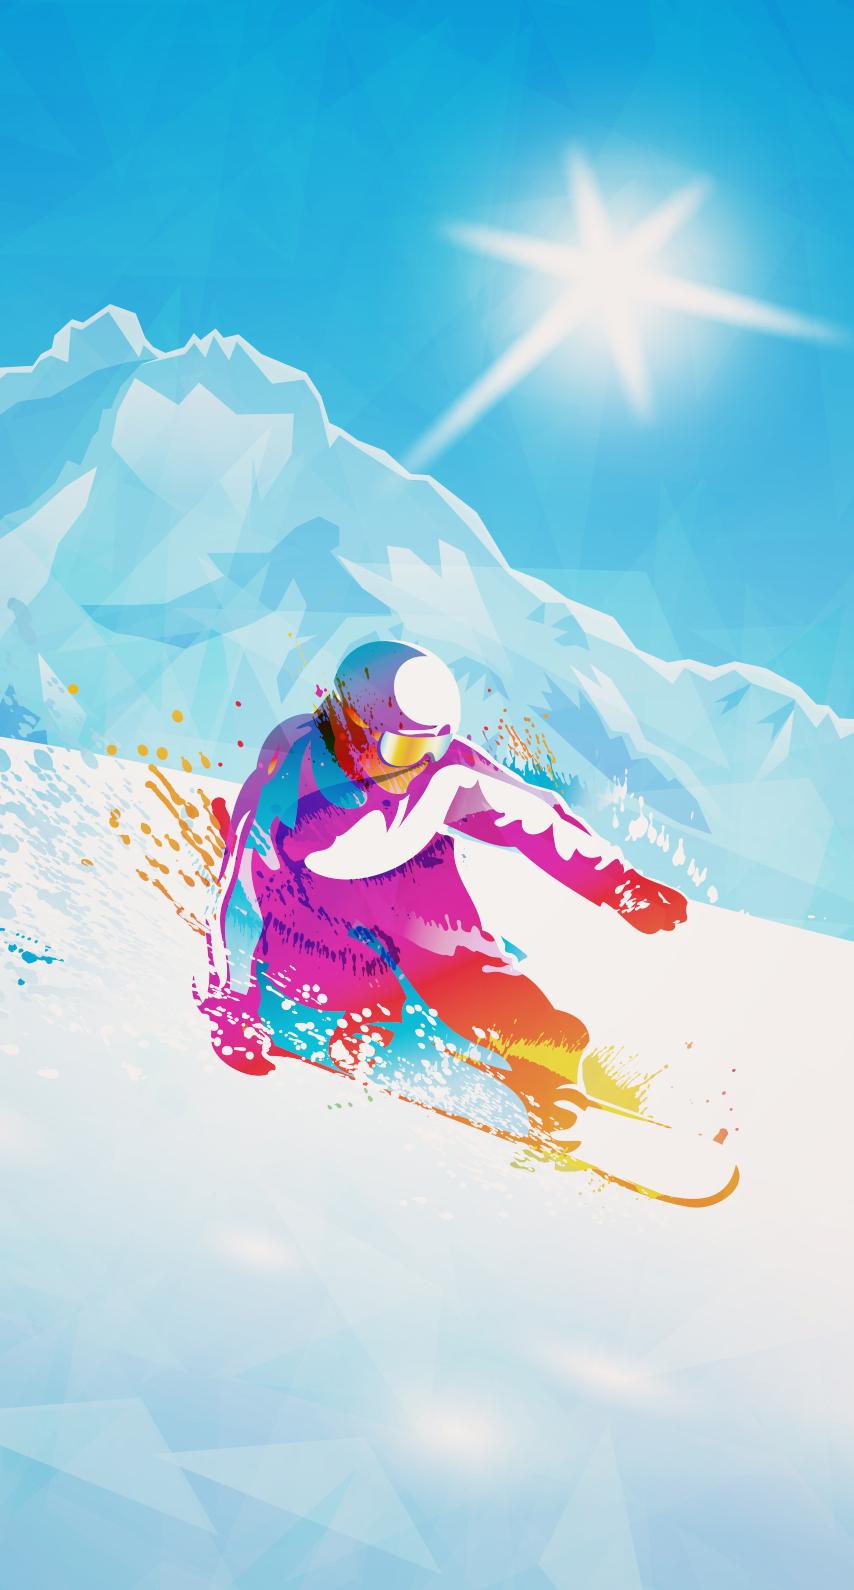 sky, snowboarding